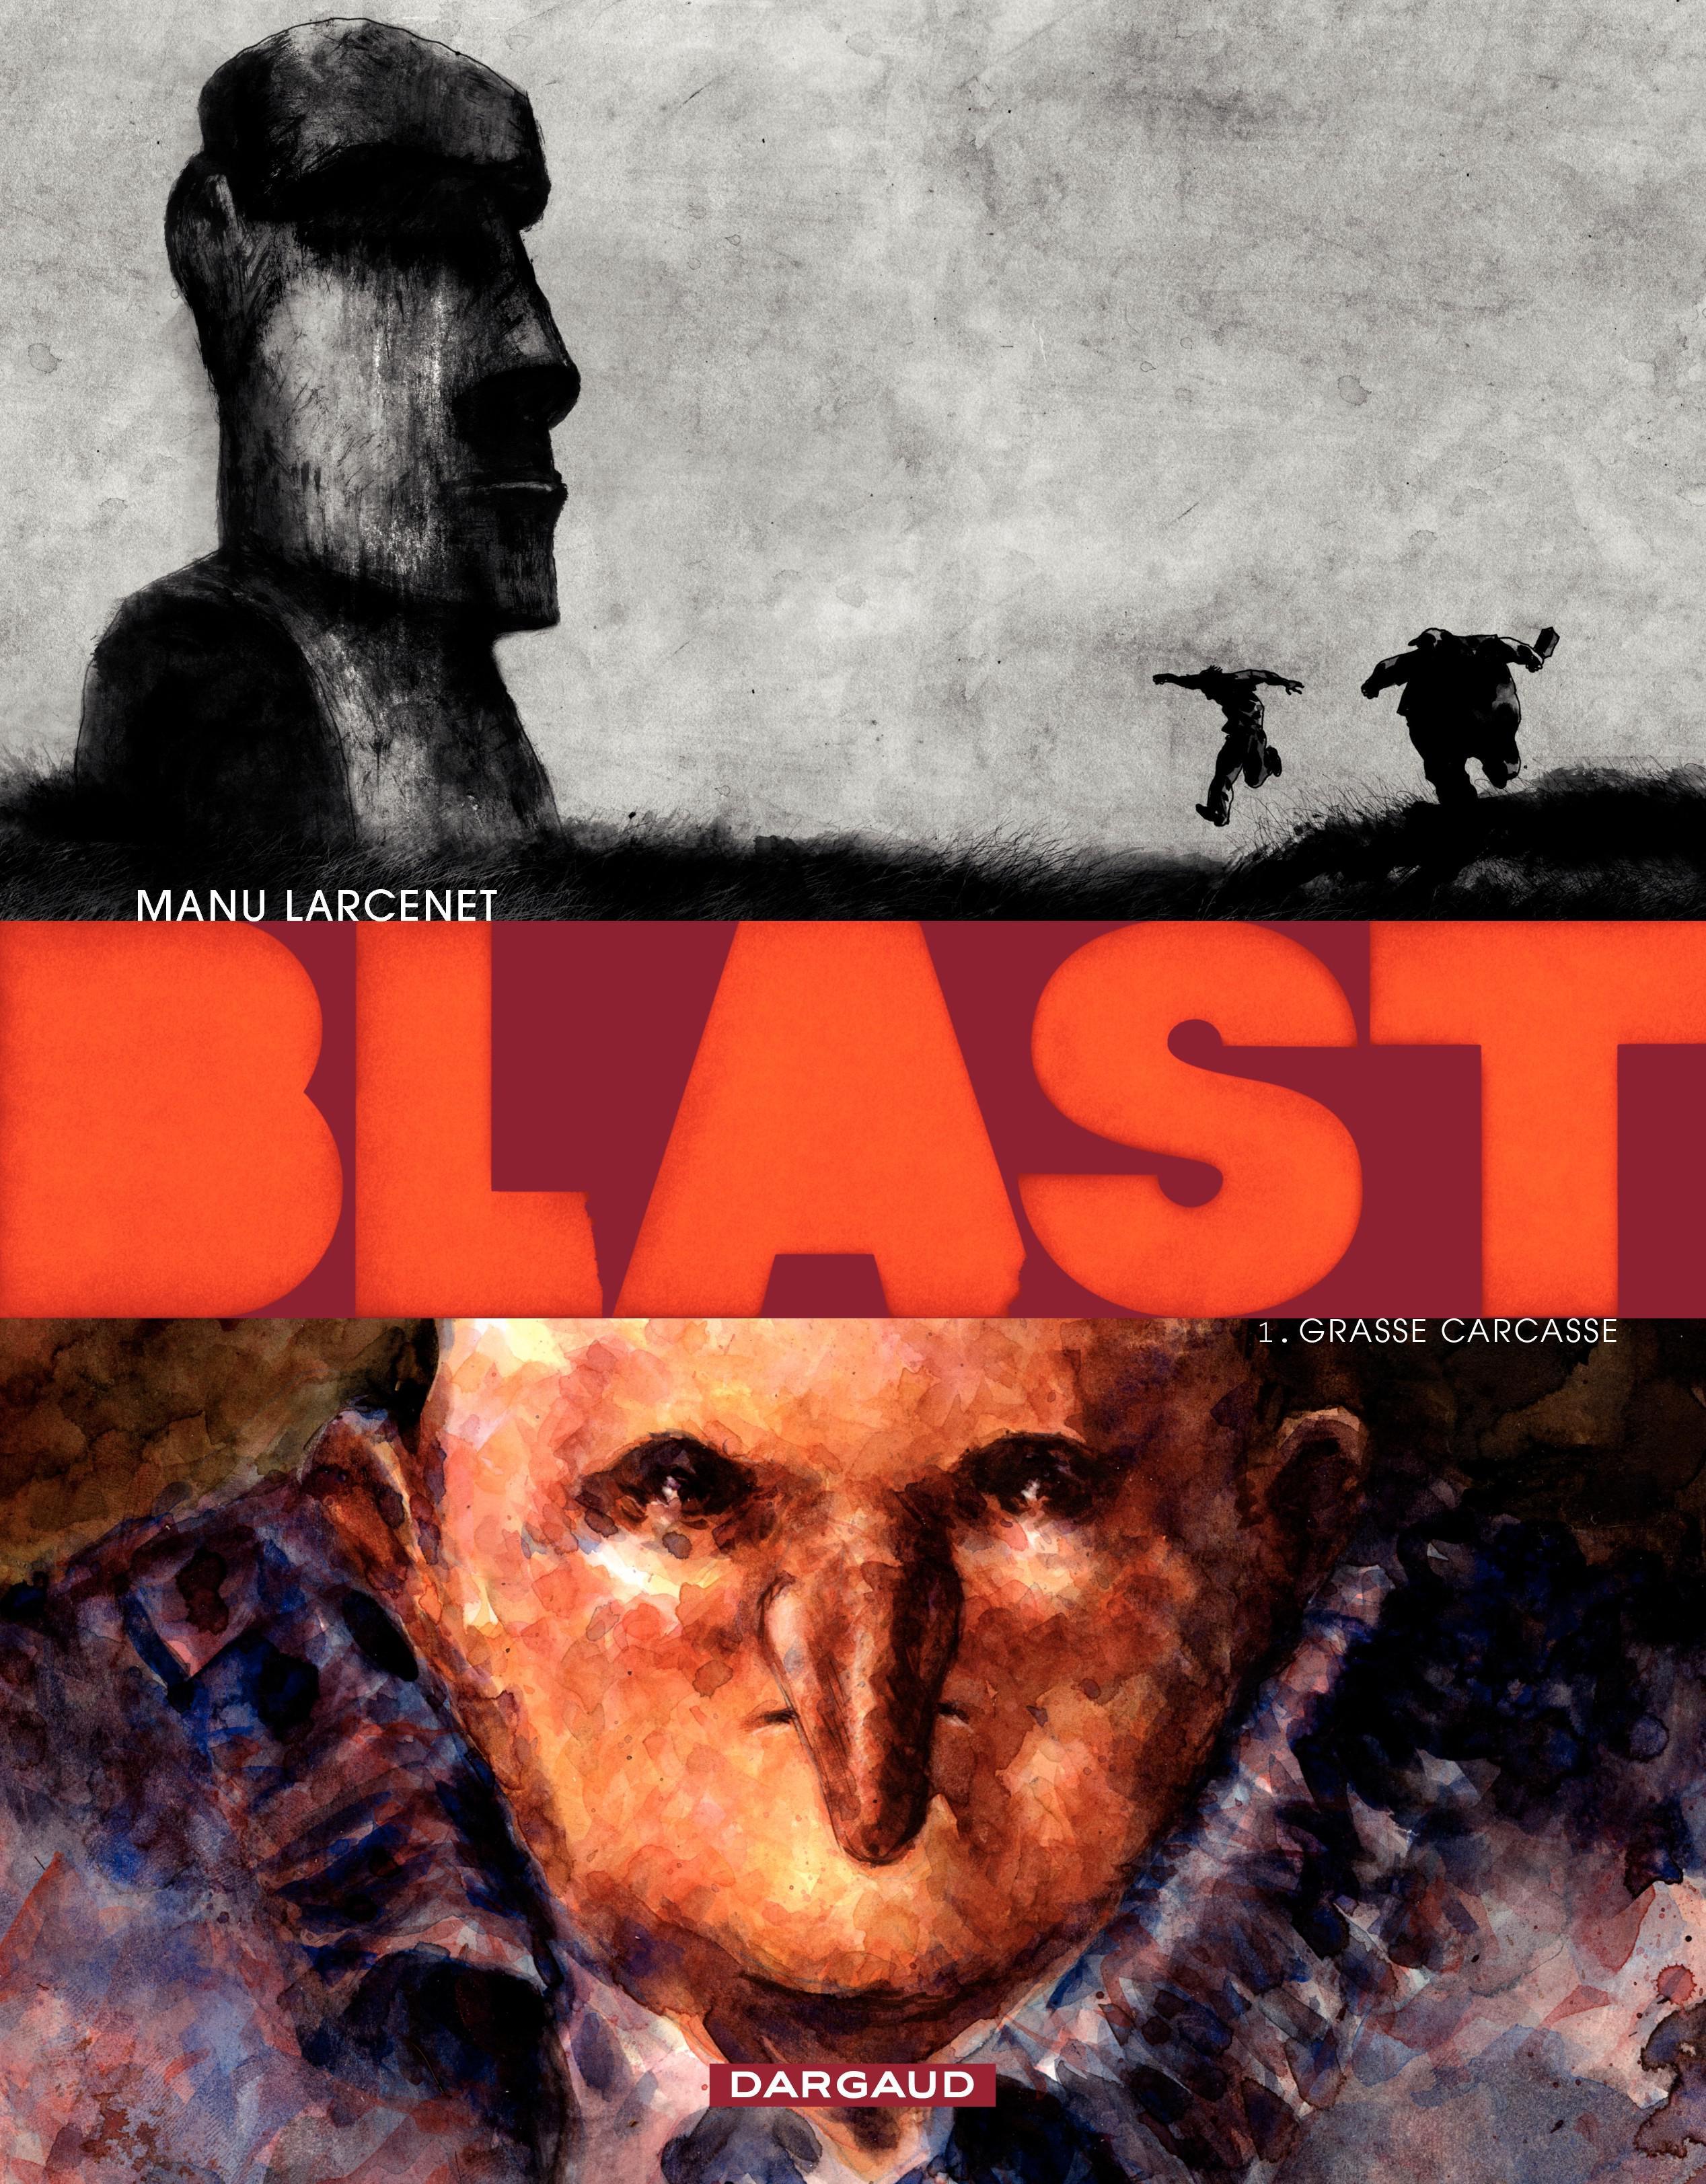 Blast T.1 : Grasse carcasse